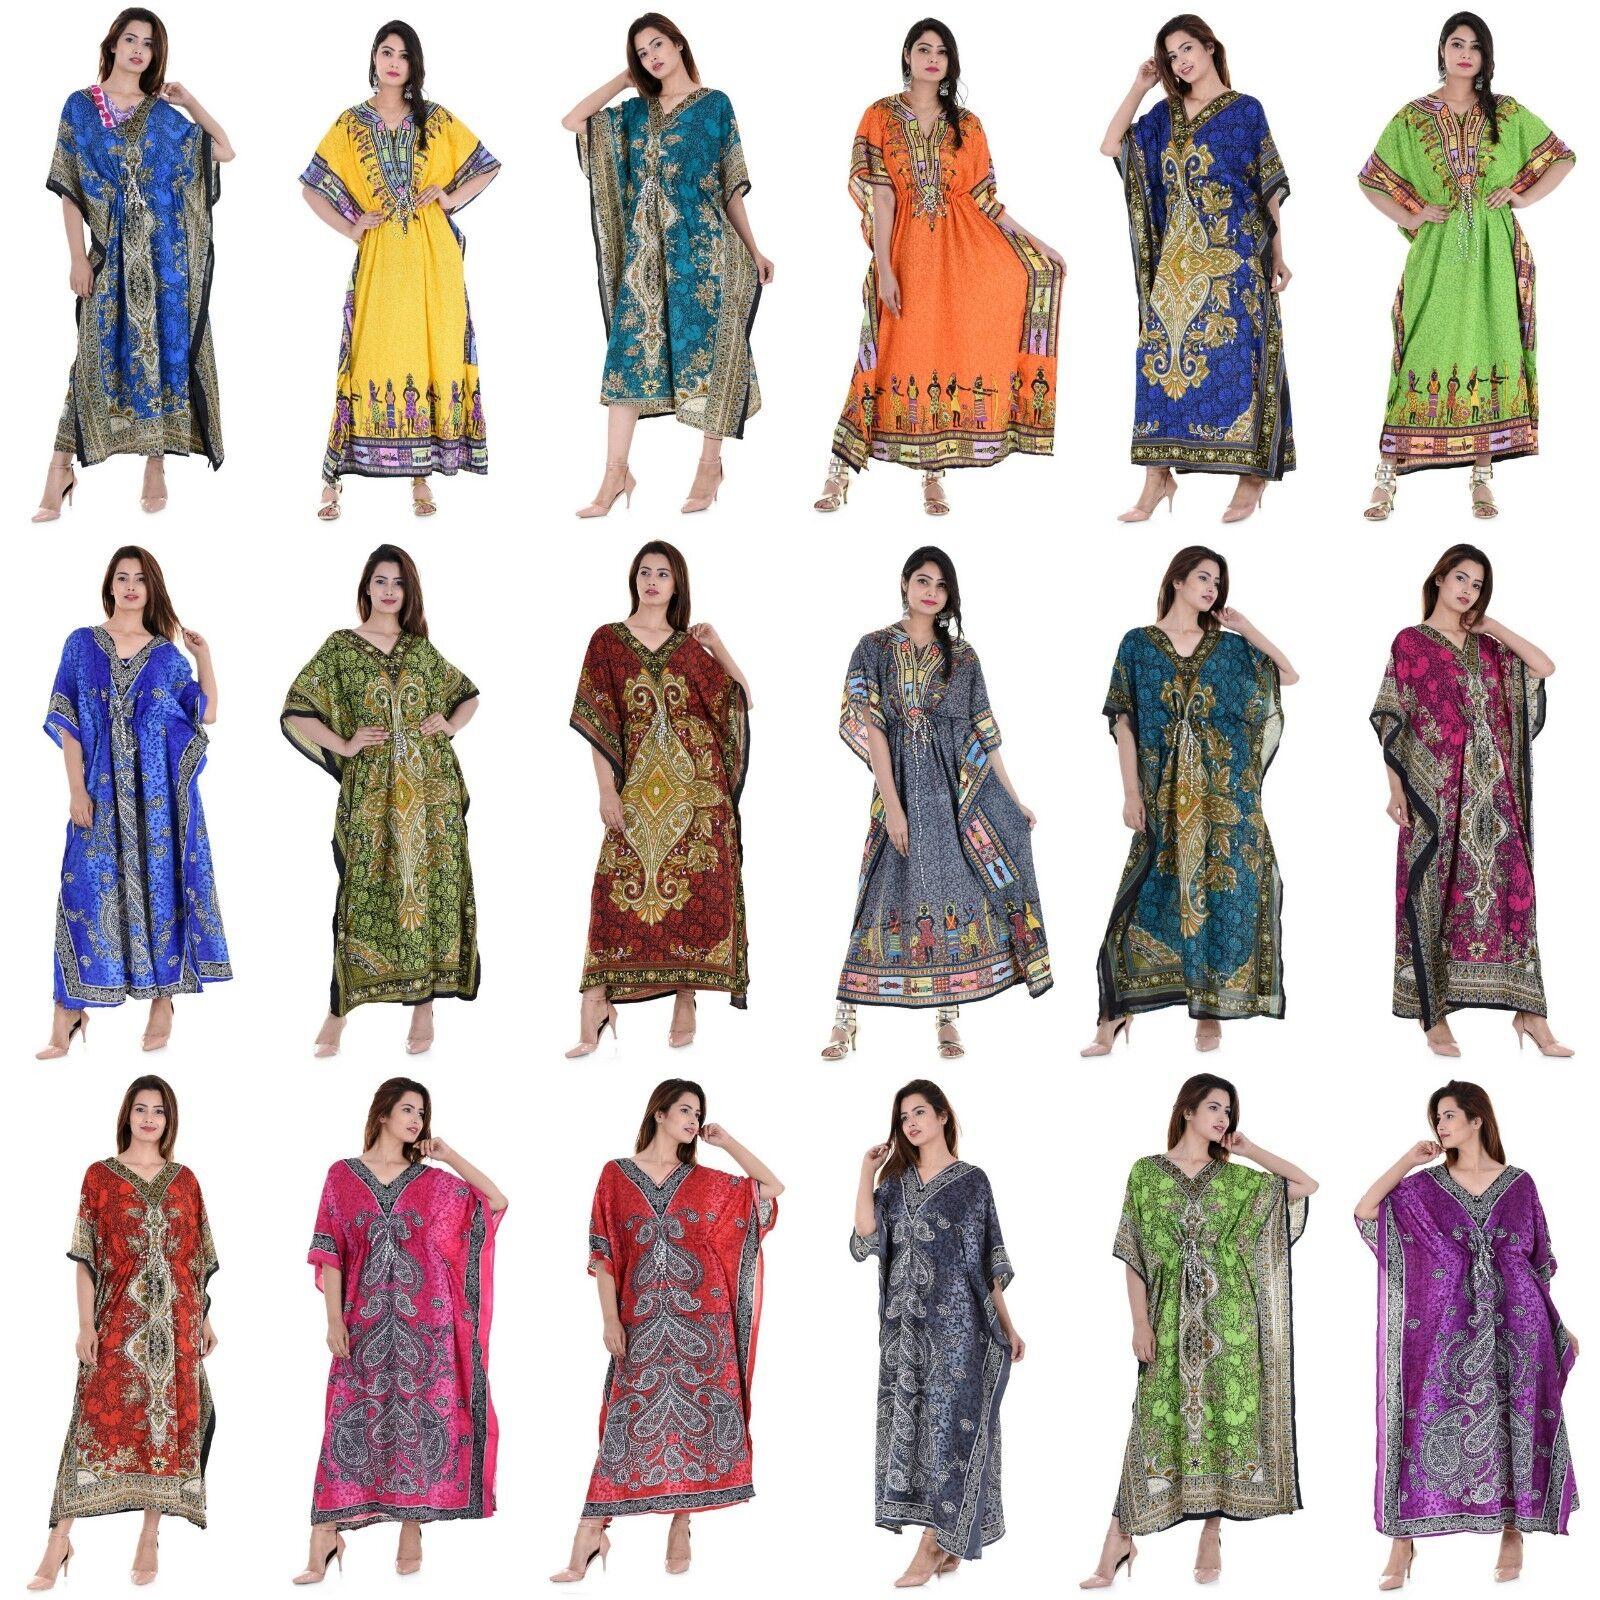 9e7aa03205aa4 Wholesale Lot 100 Pcs Assorted Women Long One Size Plus Maxi Kaftan ...